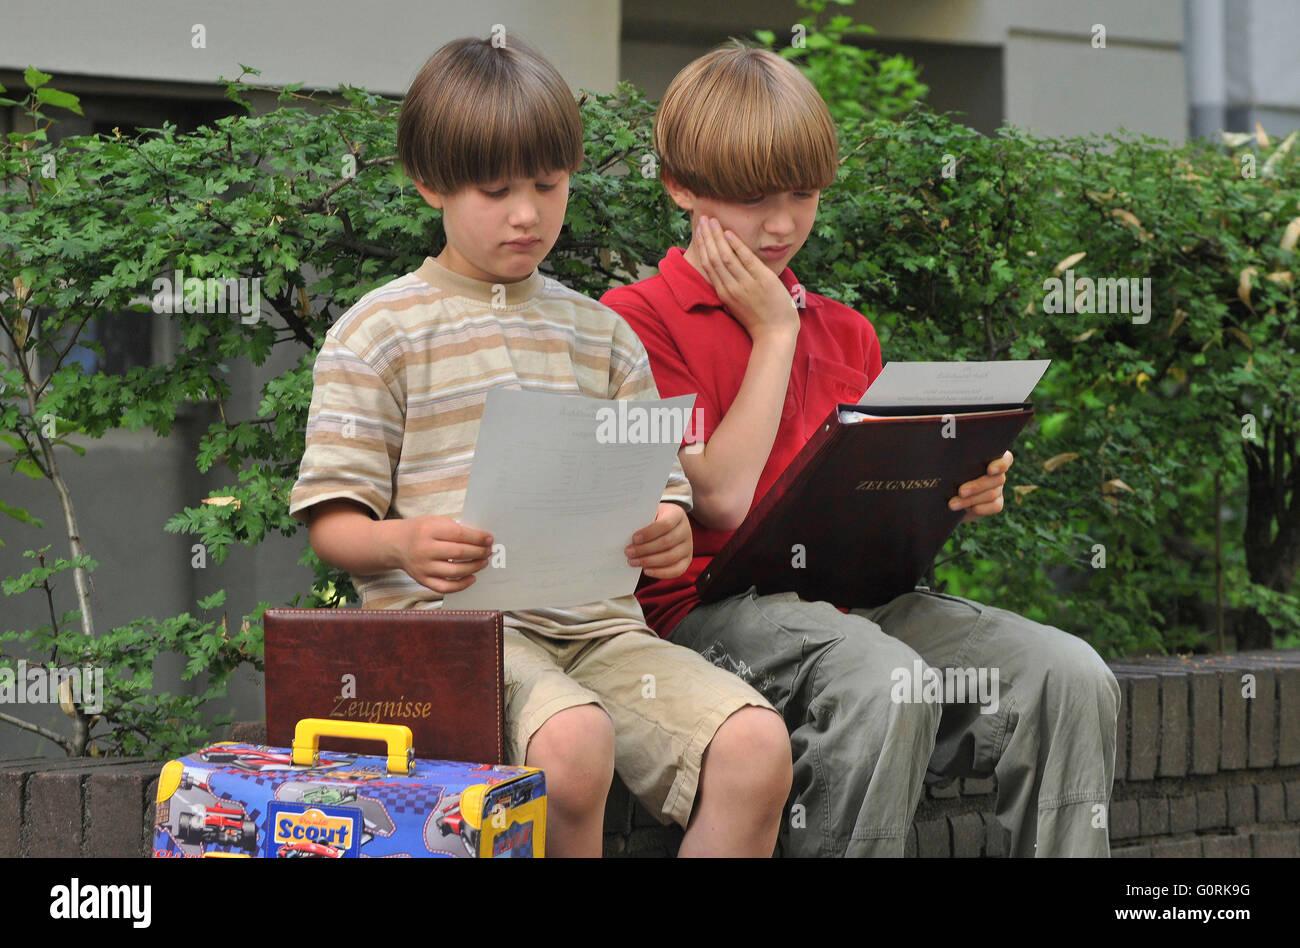 Schoolboys, schoolboy, schoolchildren, schoolchild, pupils, pupil, bad report, mark, grade - Stock Image